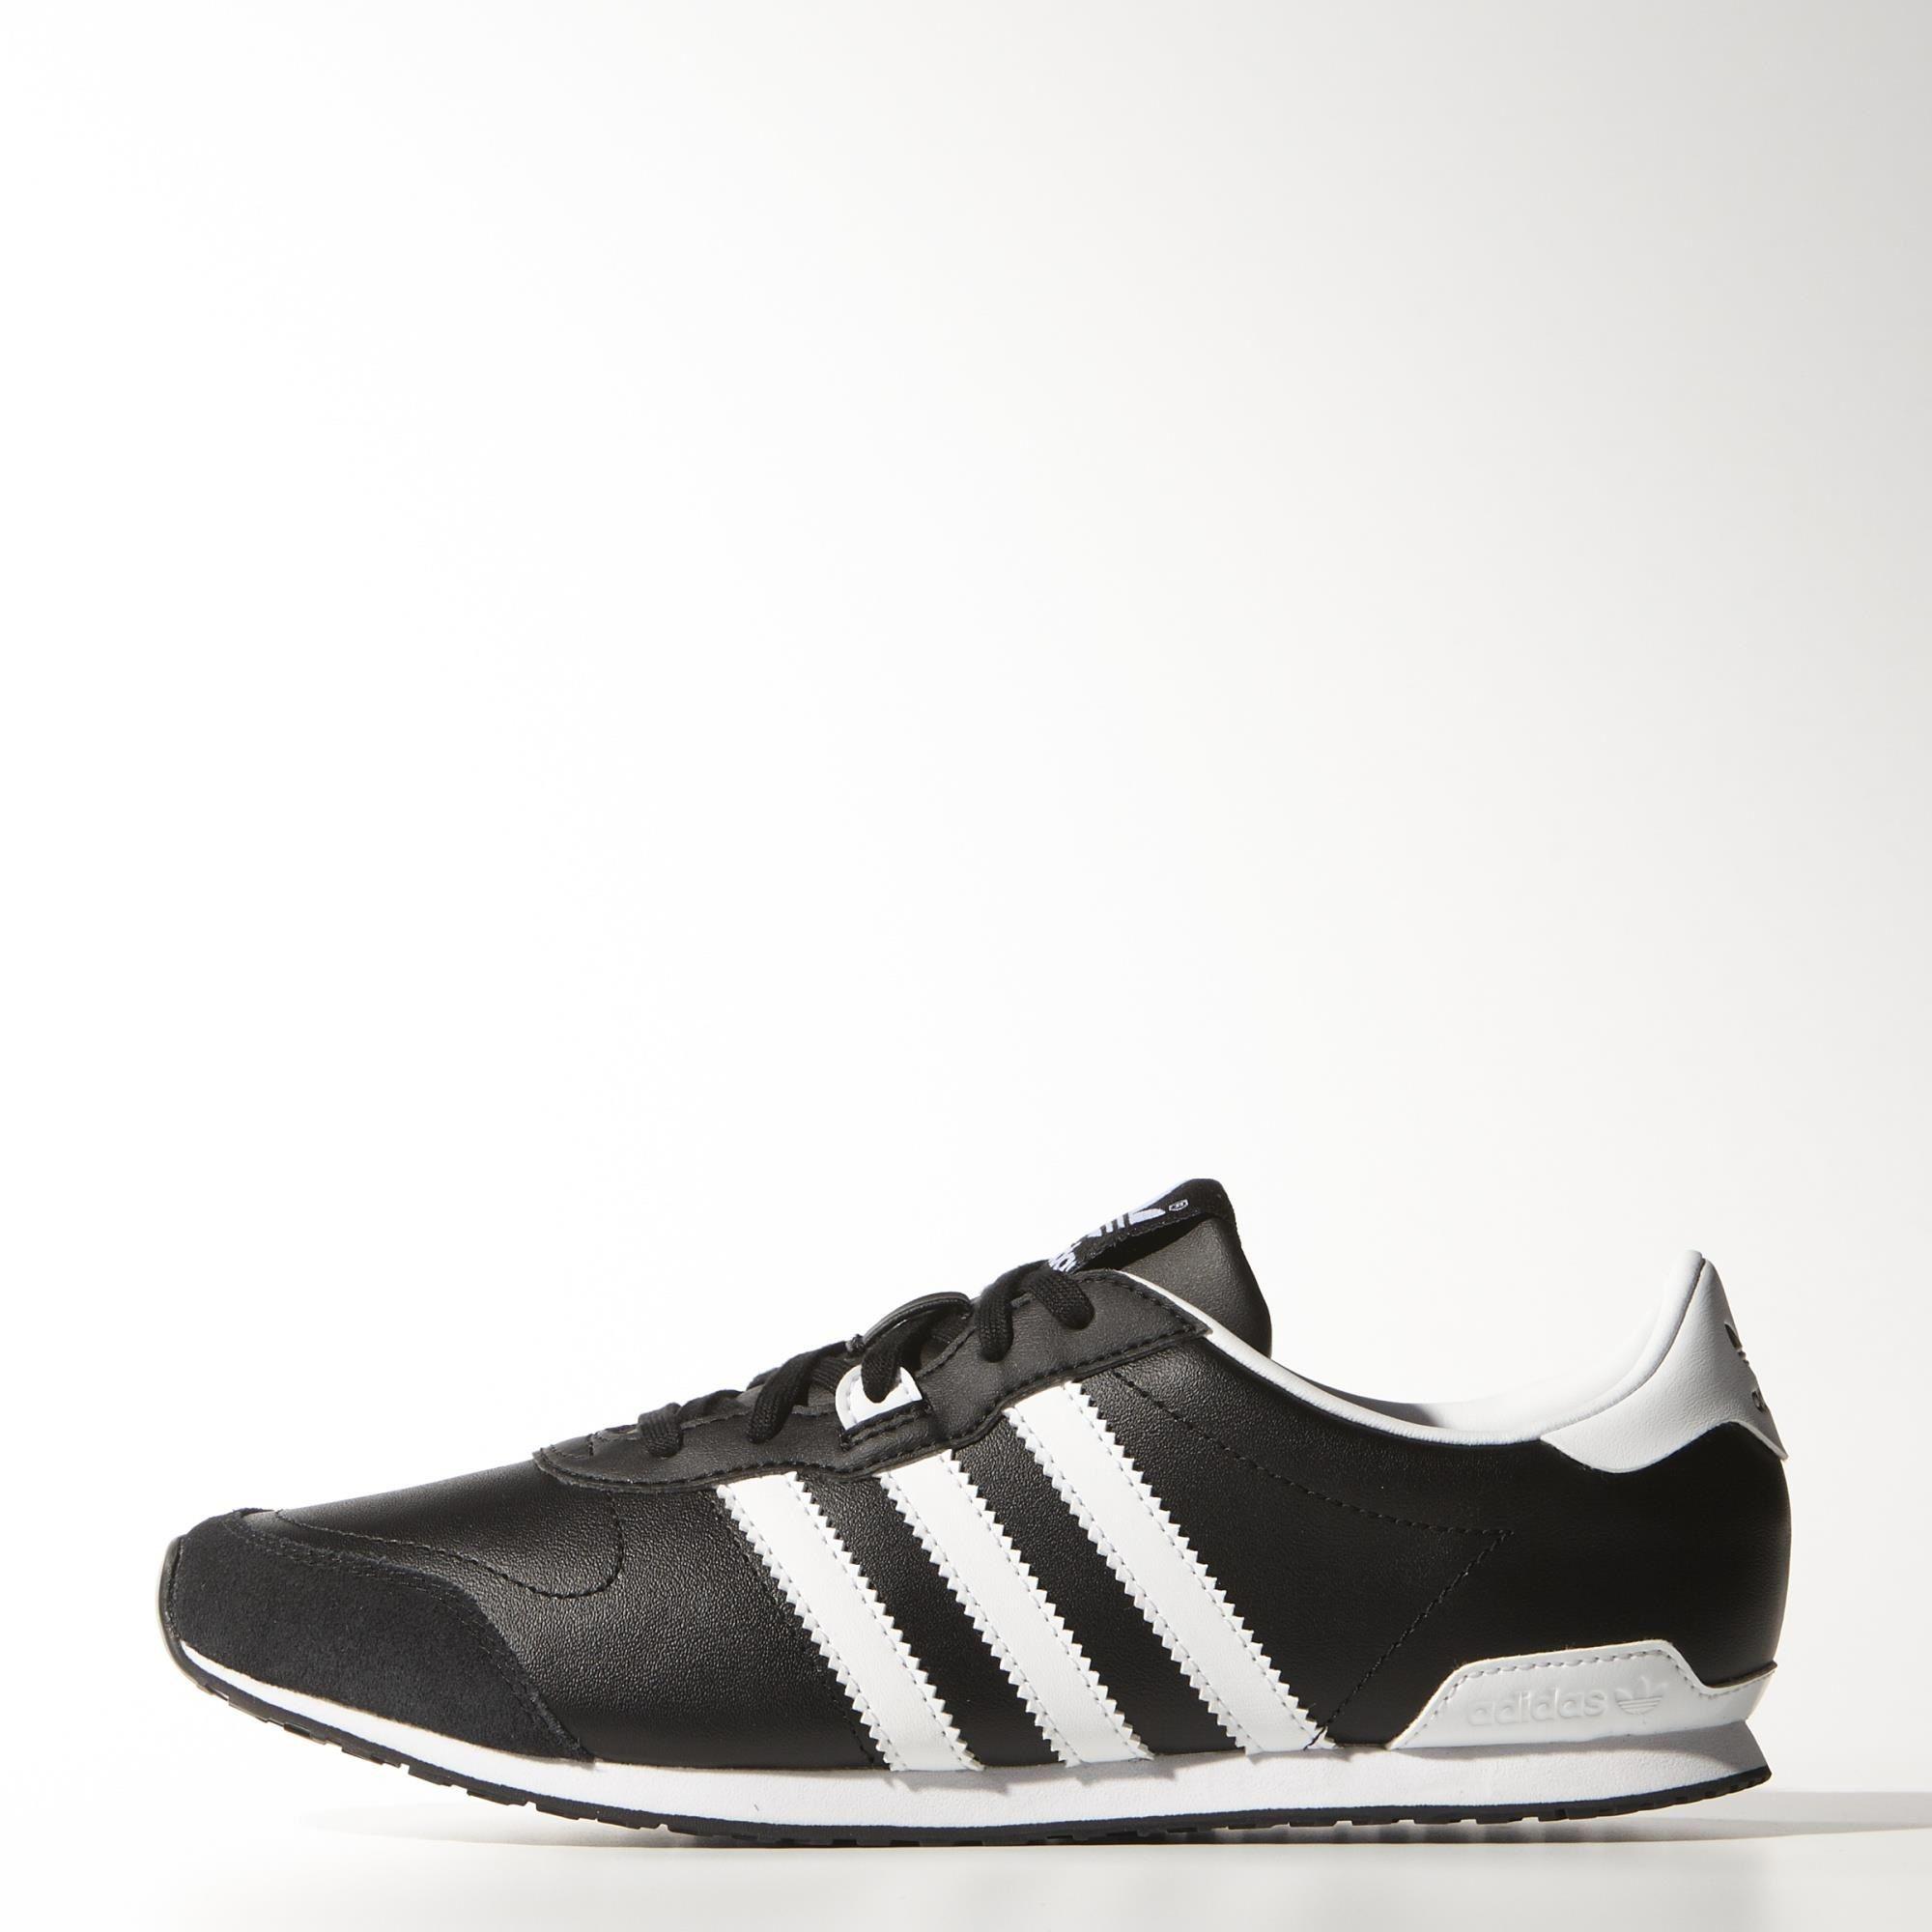 tenis adidas zx 700